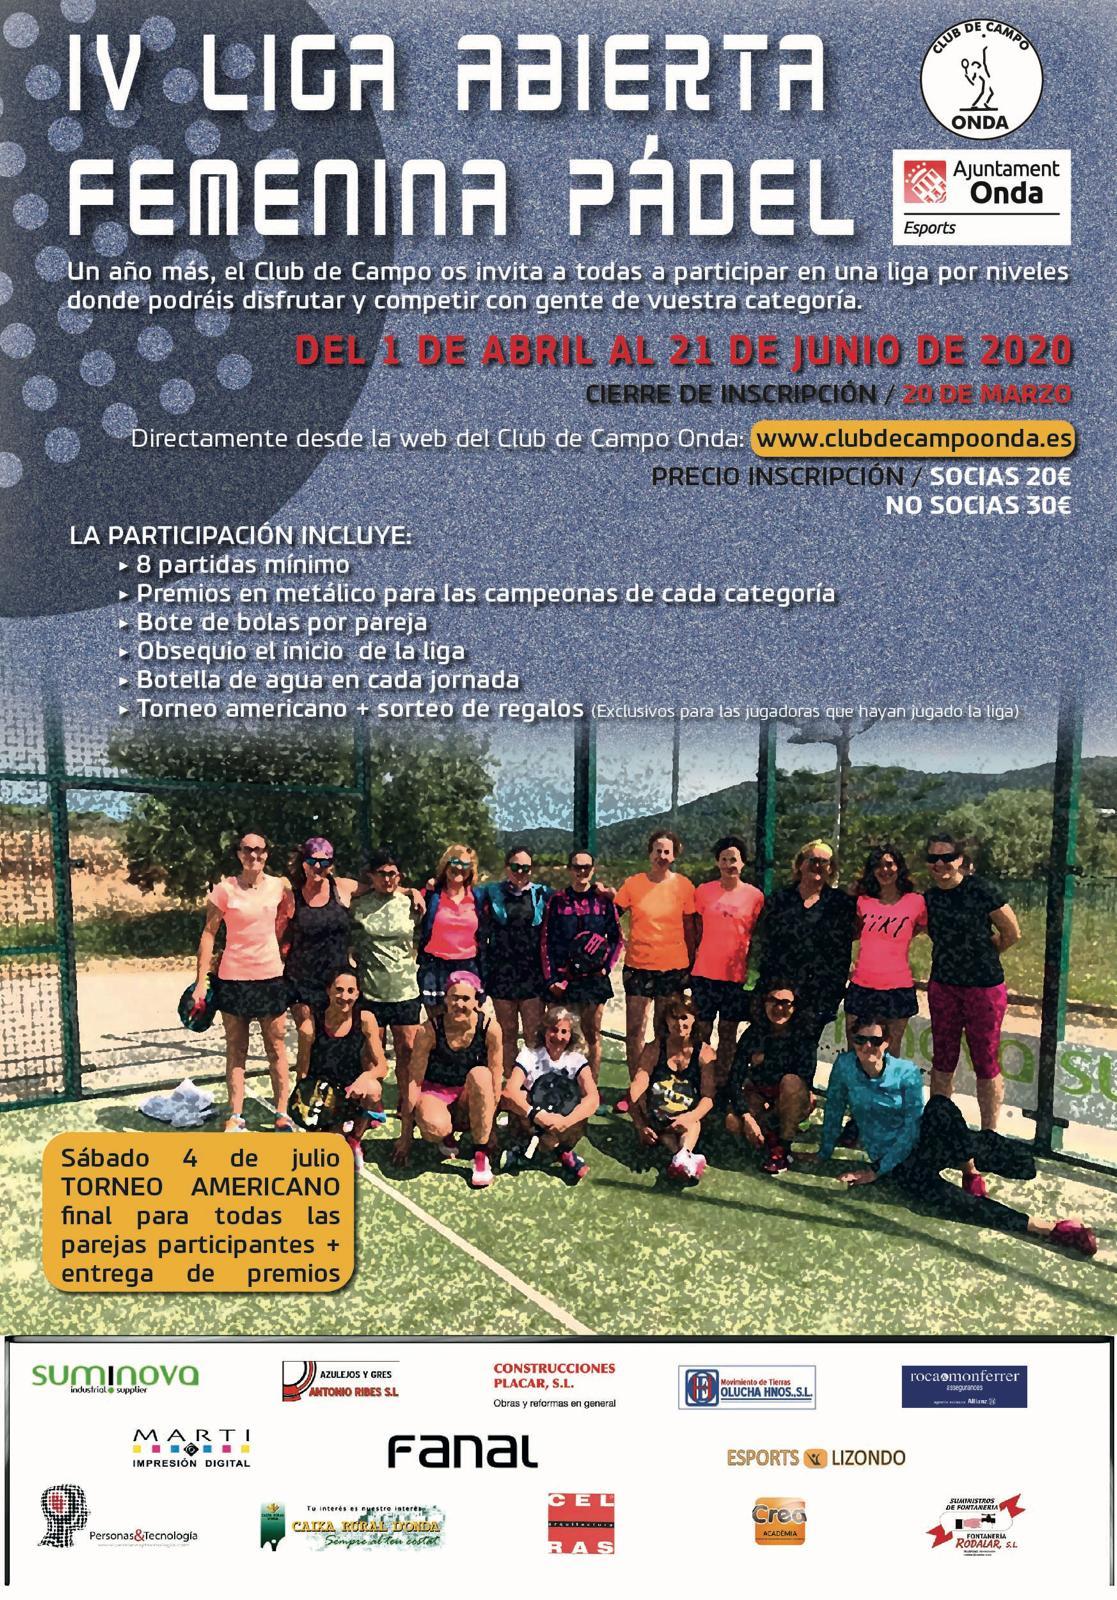 IV liga femenina de padel 2020